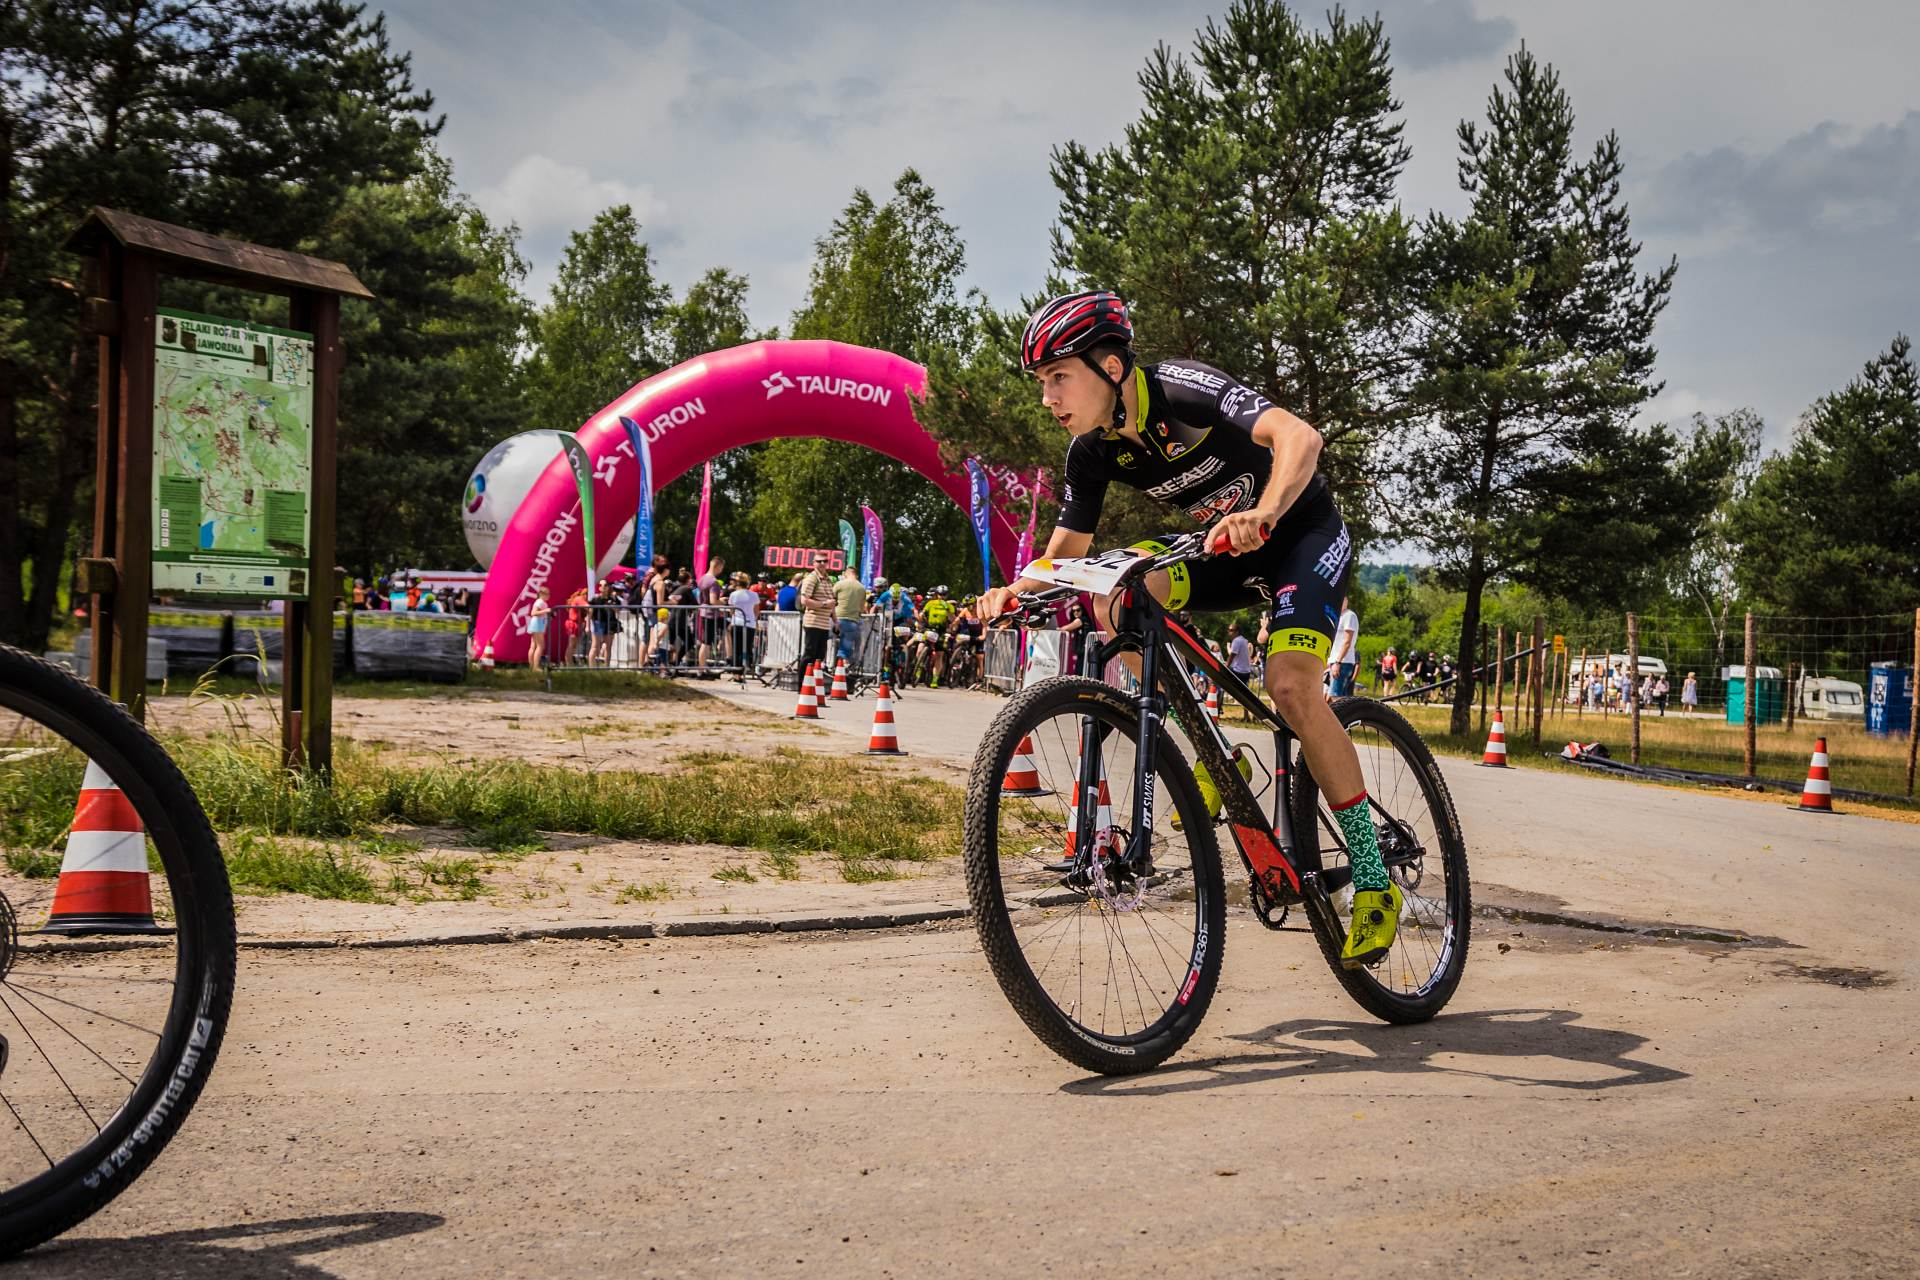 wyscig-rowerow-gorskich-0056